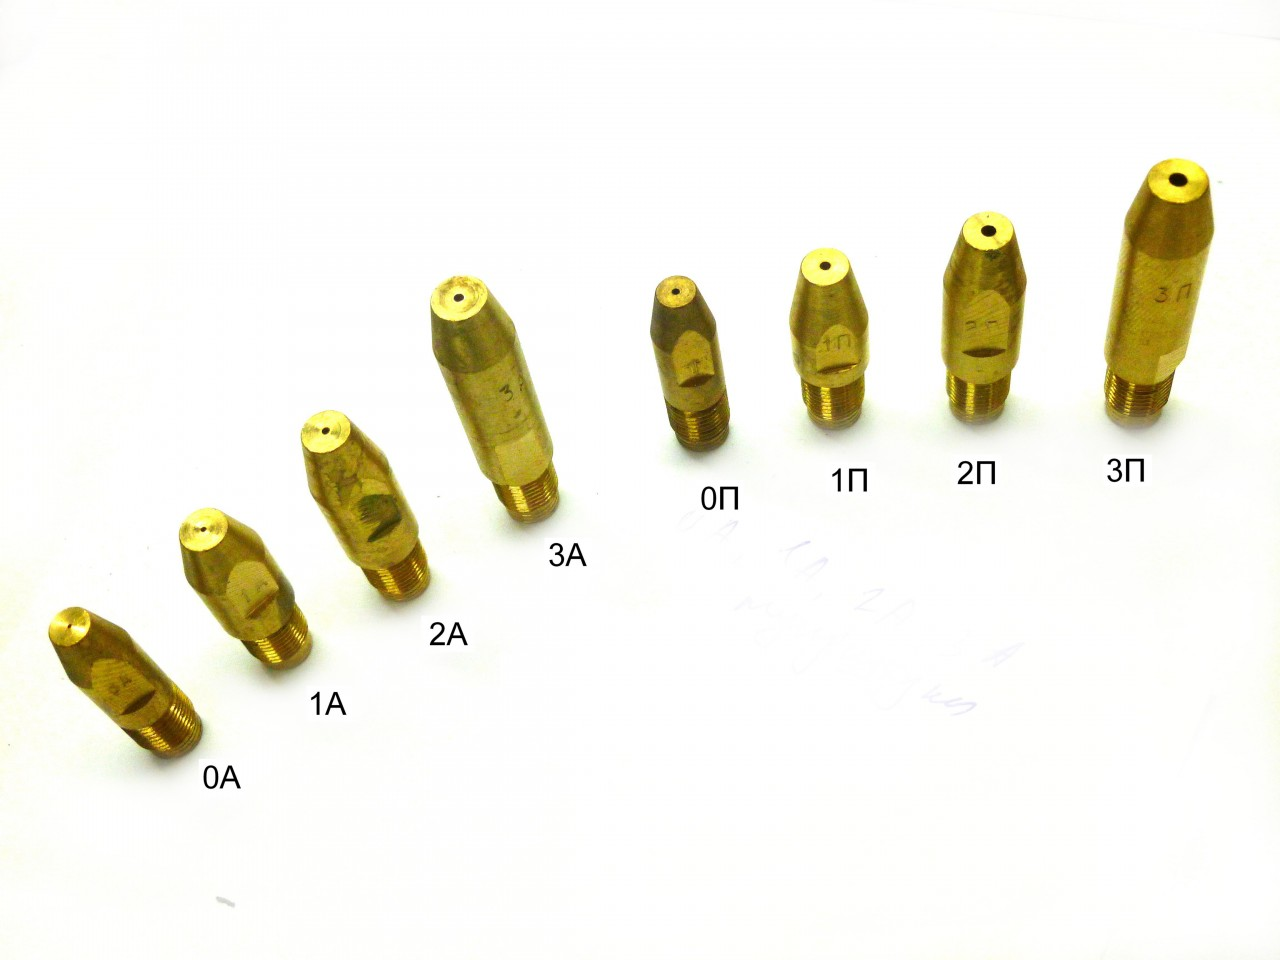 Мундштуки горелки (0А, 0П, 1А, 1П, 2А, 2П, 3А, 3П)-